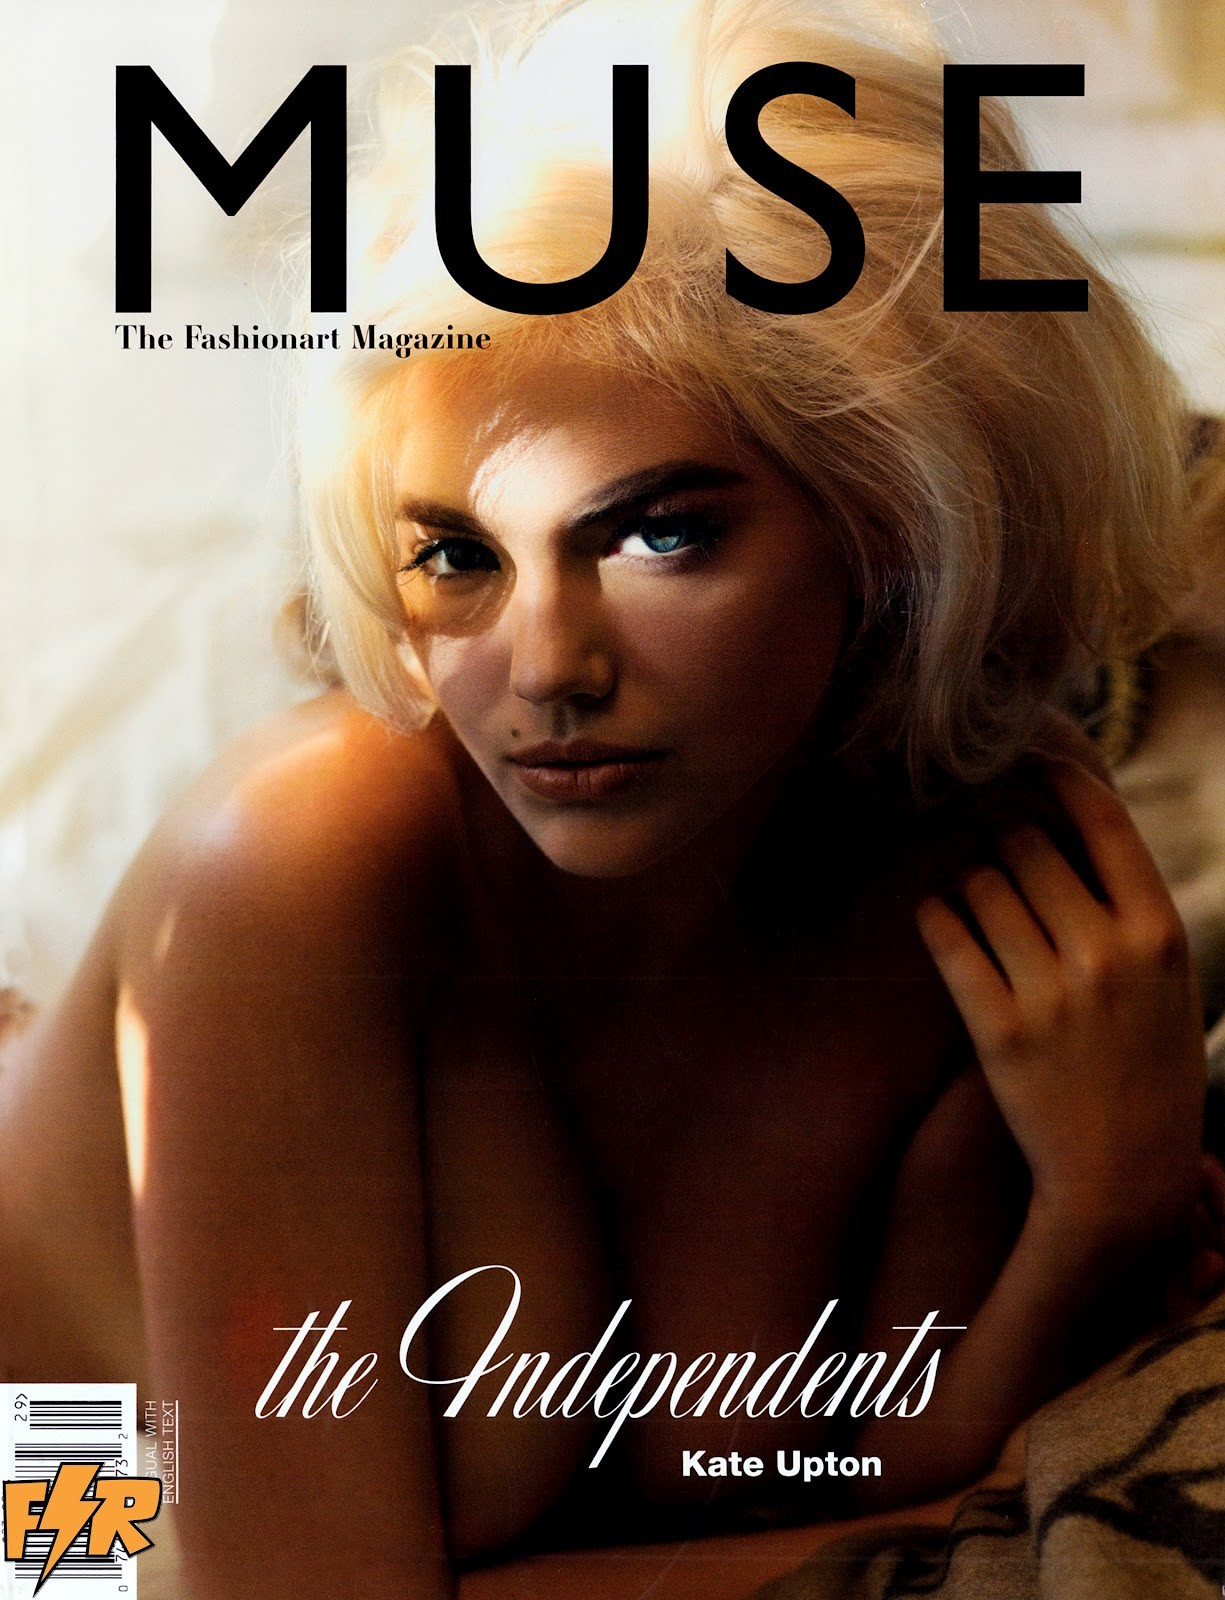 http://4.bp.blogspot.com/-yoTxuYKseeU/T5jHjyciQ-I/AAAAAAAAHDY/dtYbphZhq58/s1600/kate-upton-muse-magazine-2.jpg